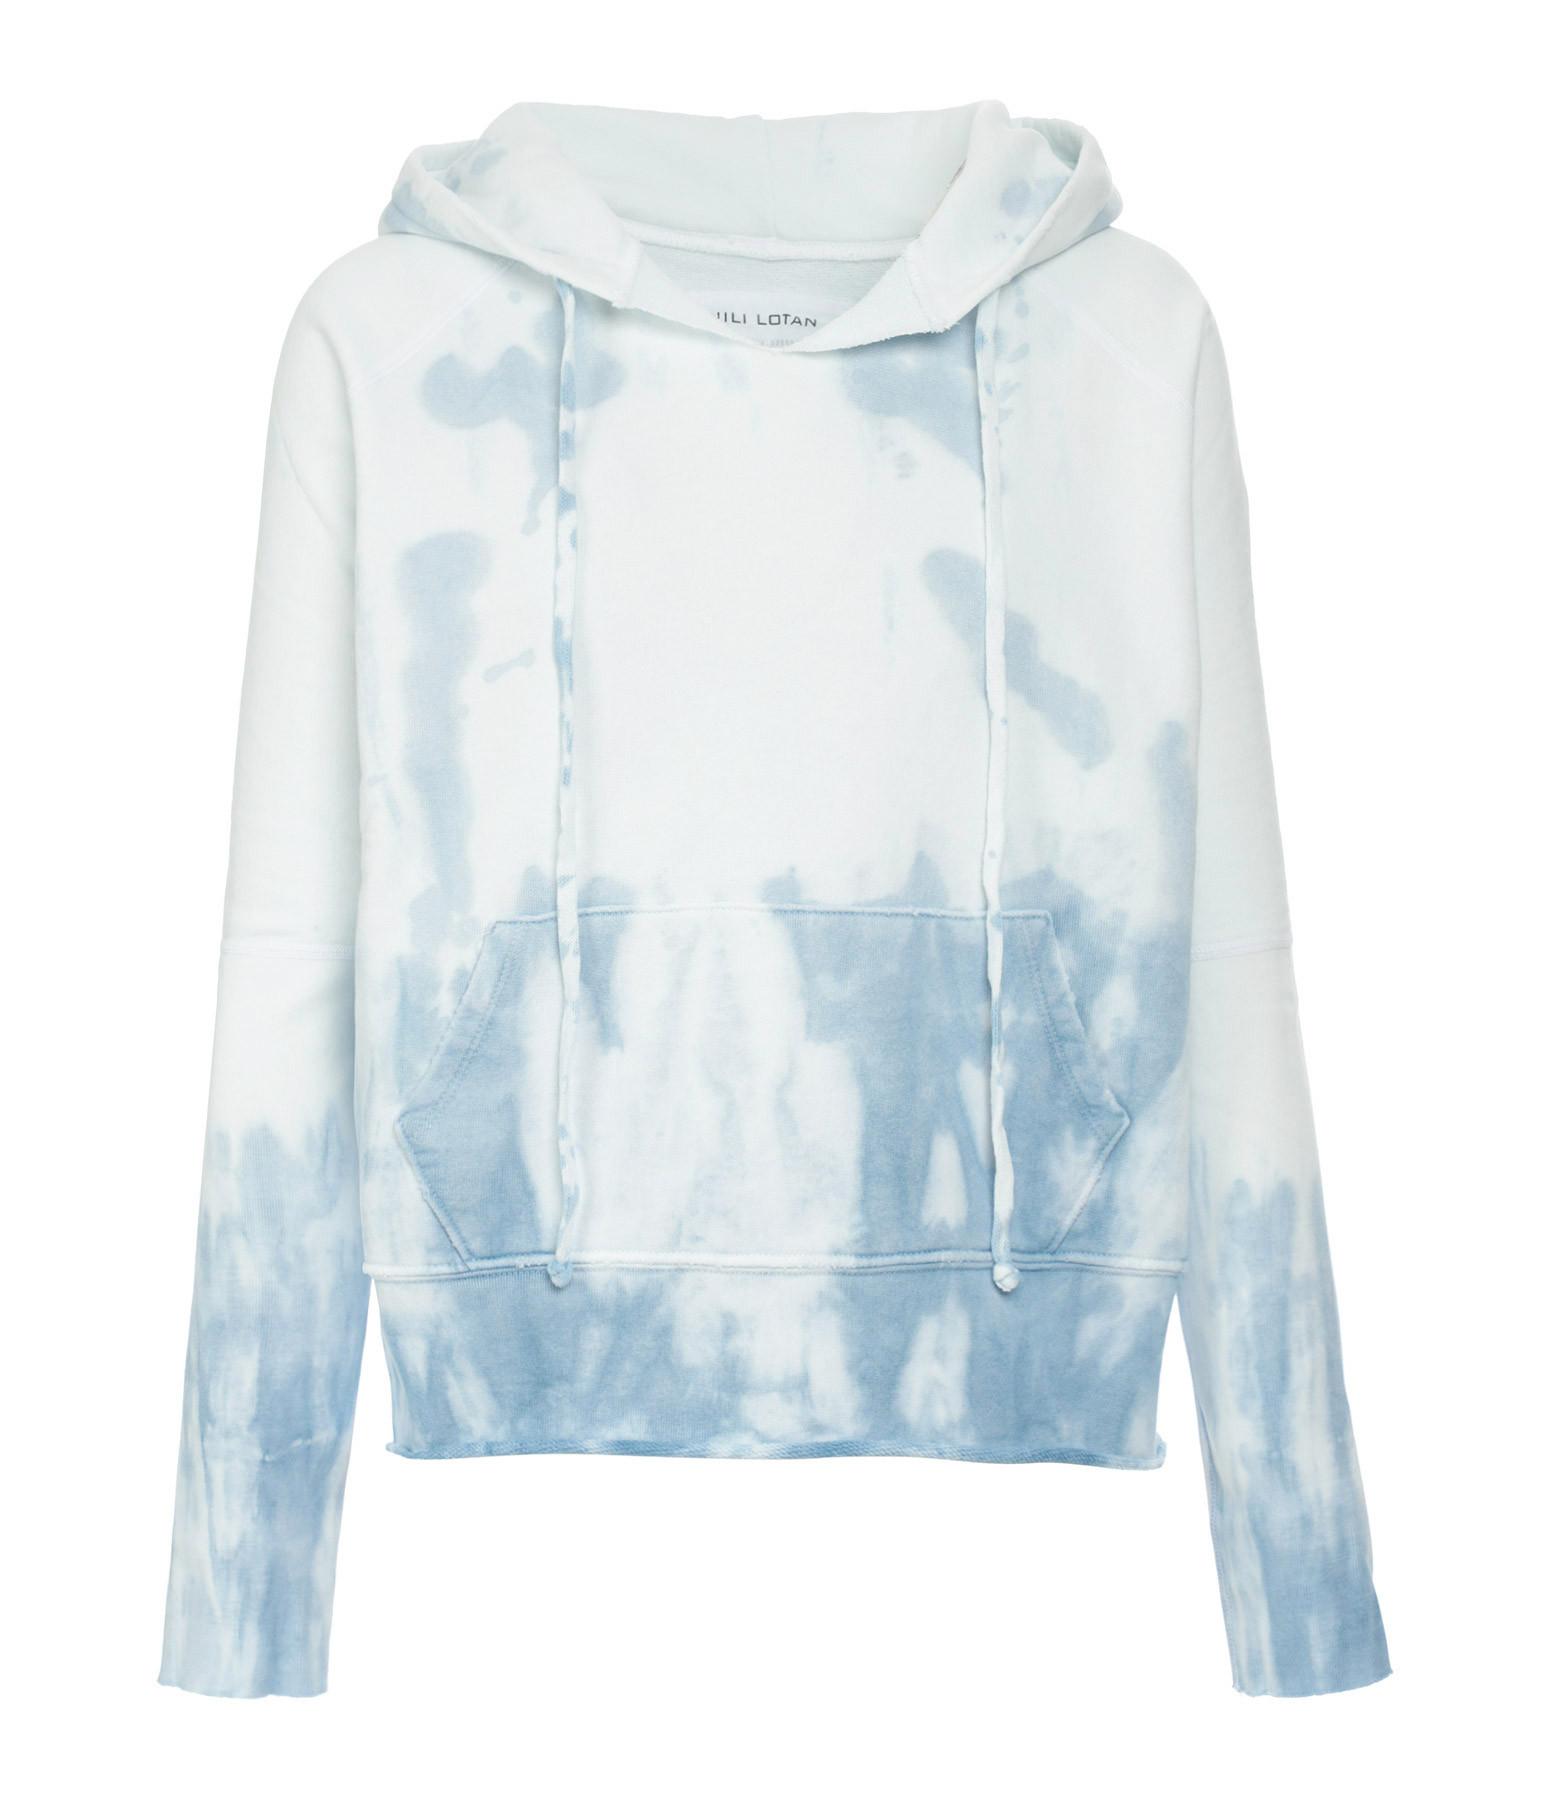 NILI LOTAN - Sweatshirt Janie Tie and Dye Bleu